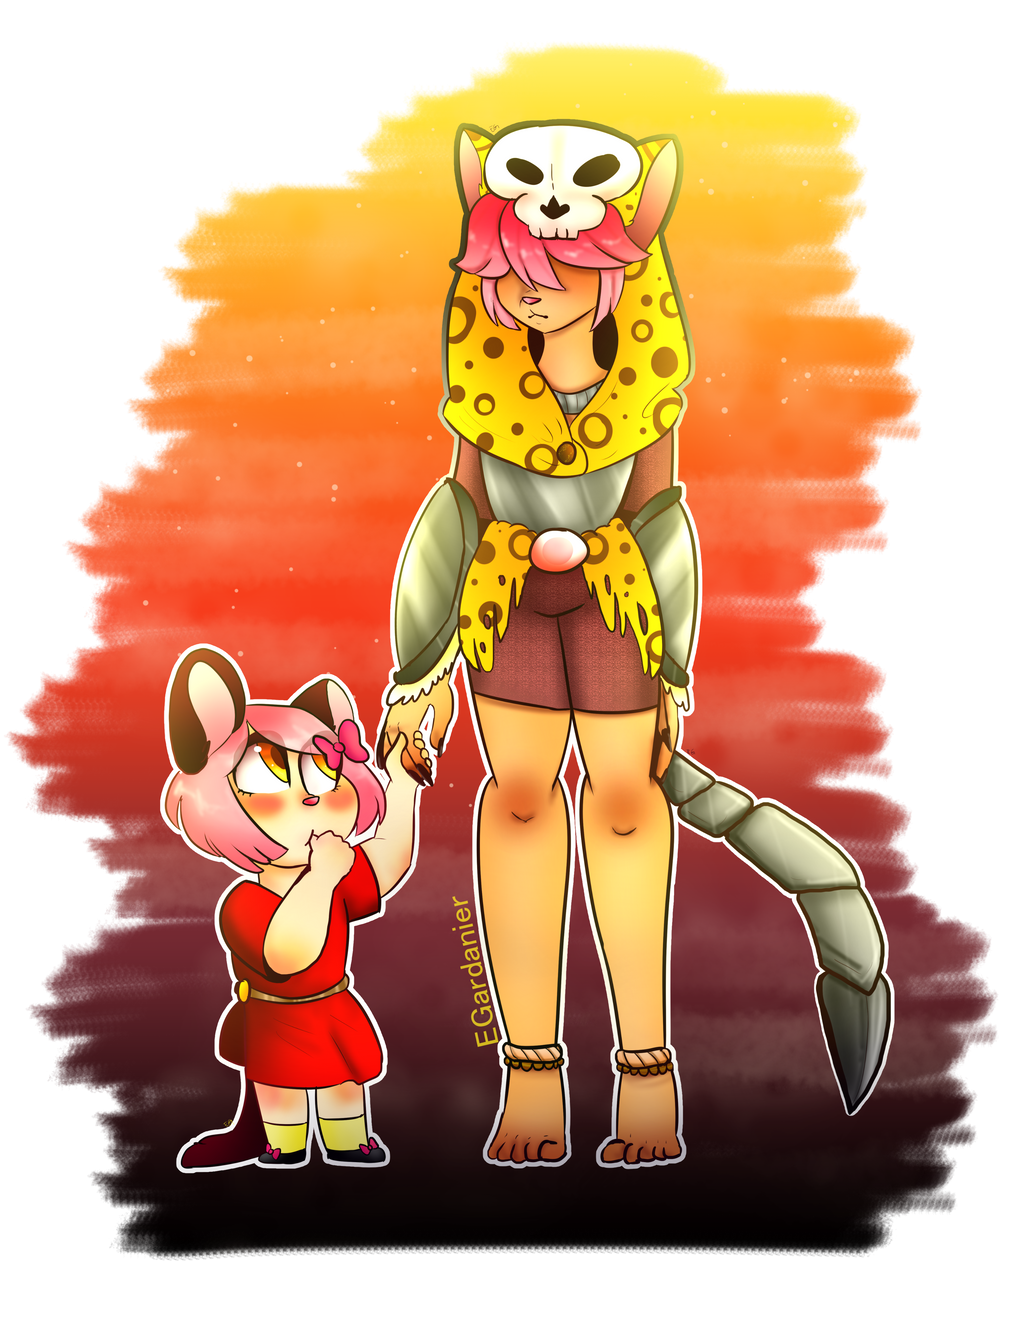 Kawaii~chan's Mom by egardanier on DeviantArt